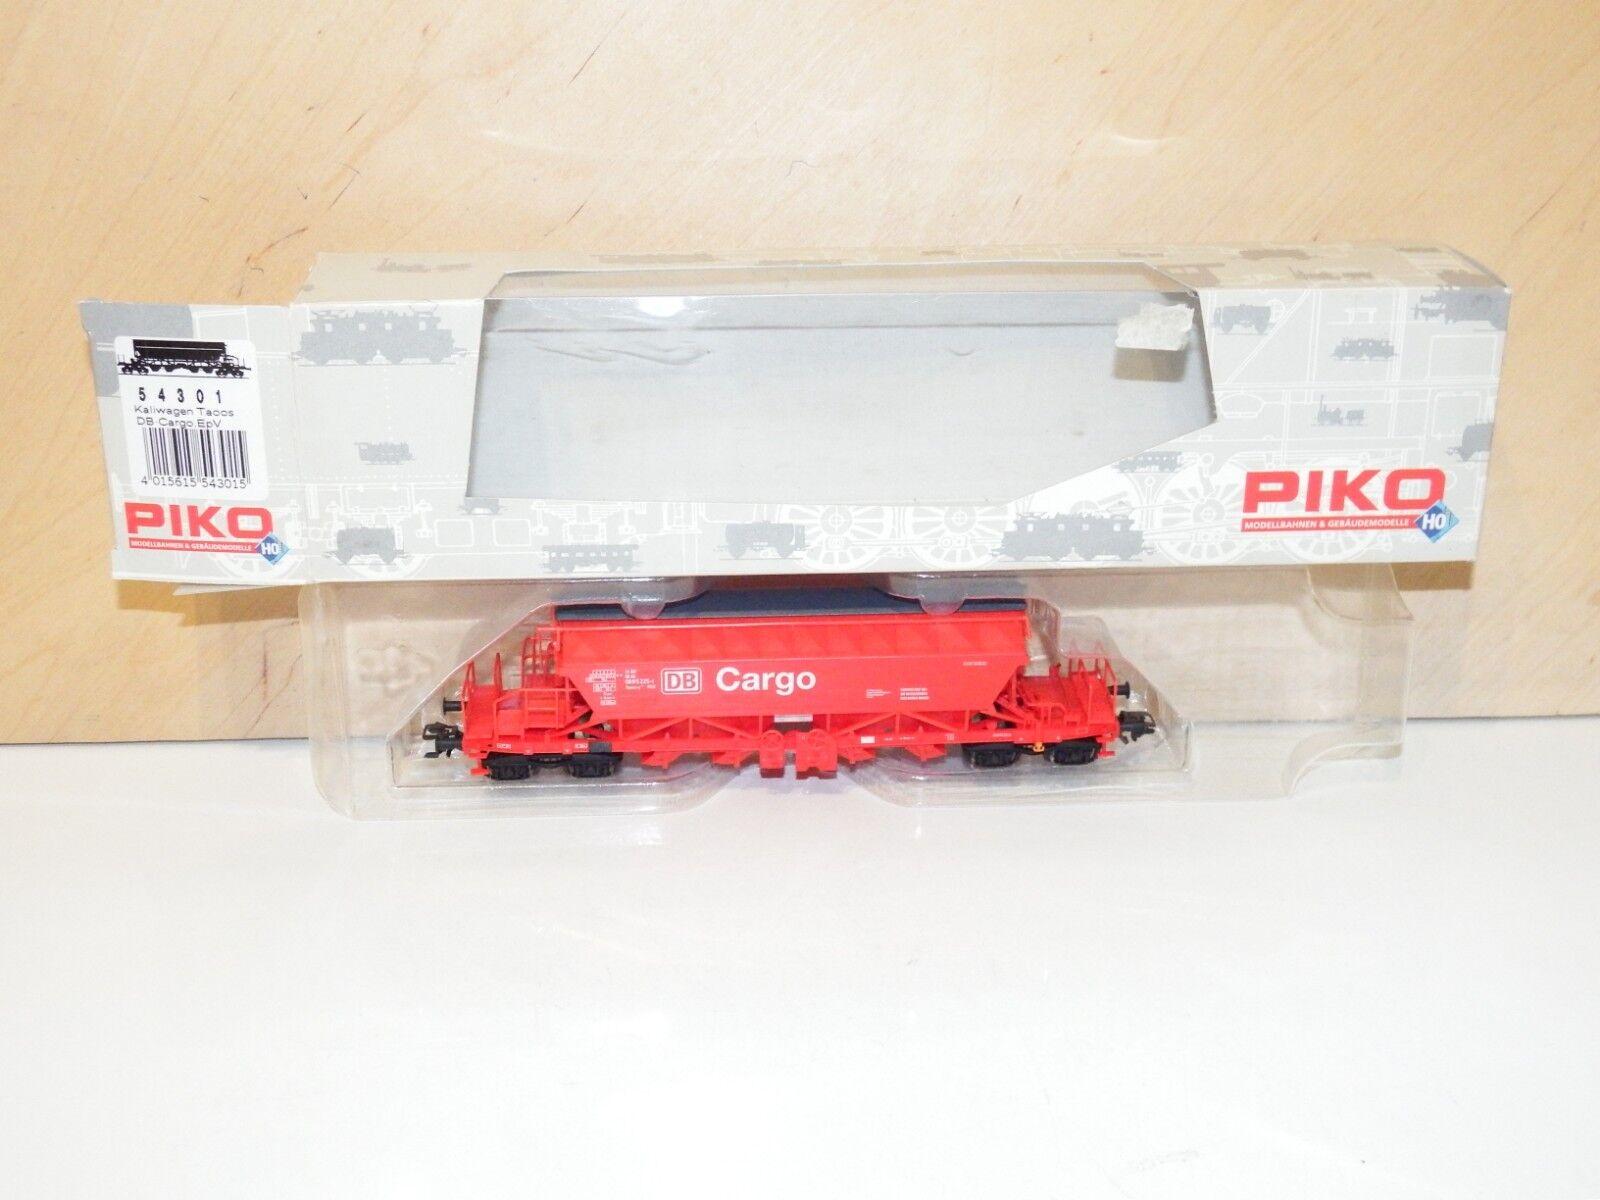 H0 Piko 54301 Kali Car taoos Freight Wagon DB Cargo NEM MINT BOXED 4983